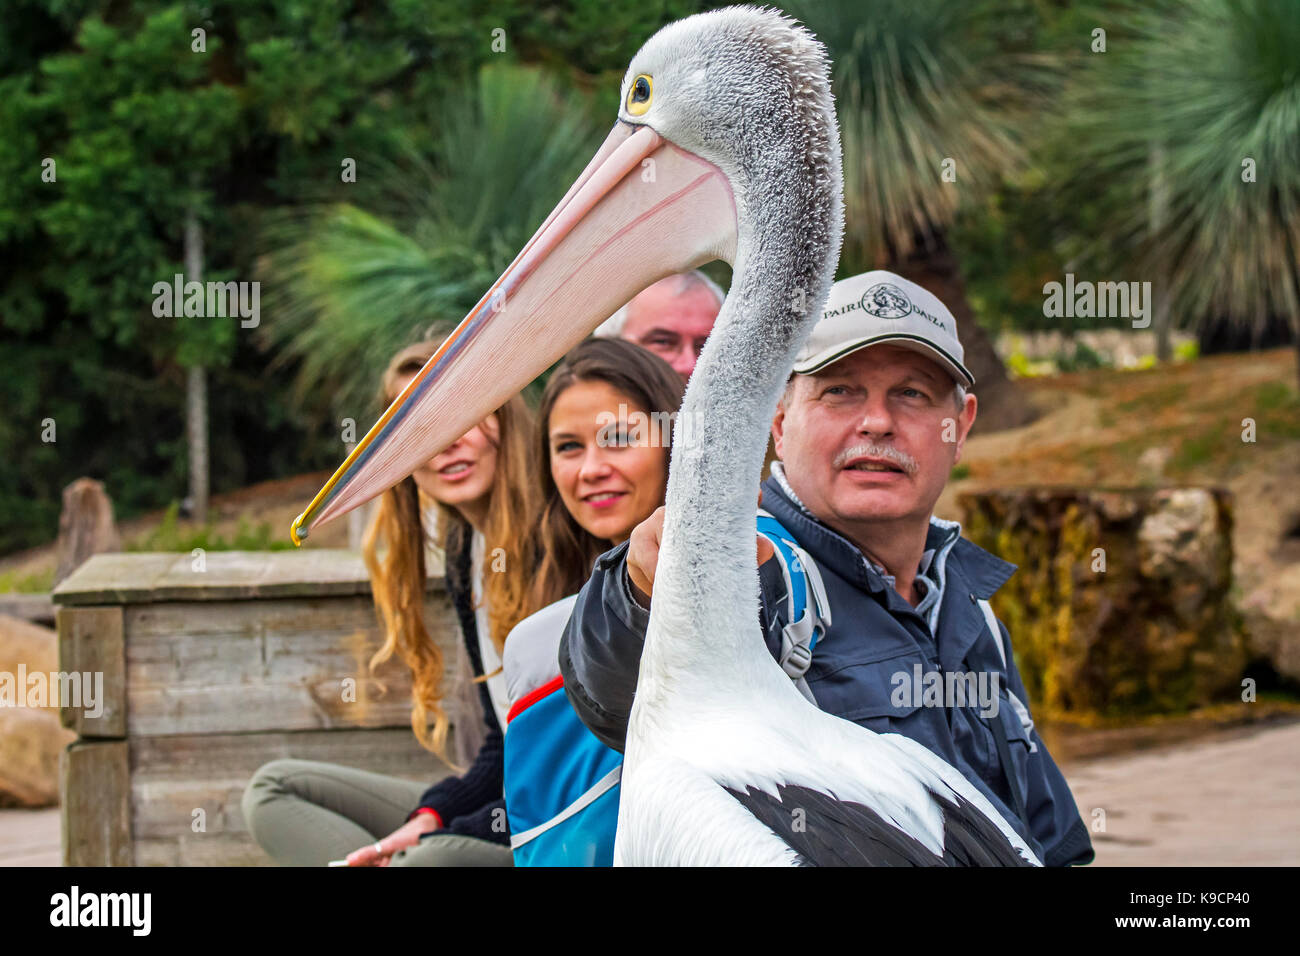 Australian pelican (Pelecanus conspicillatus) among visitors at zoo - Stock Image